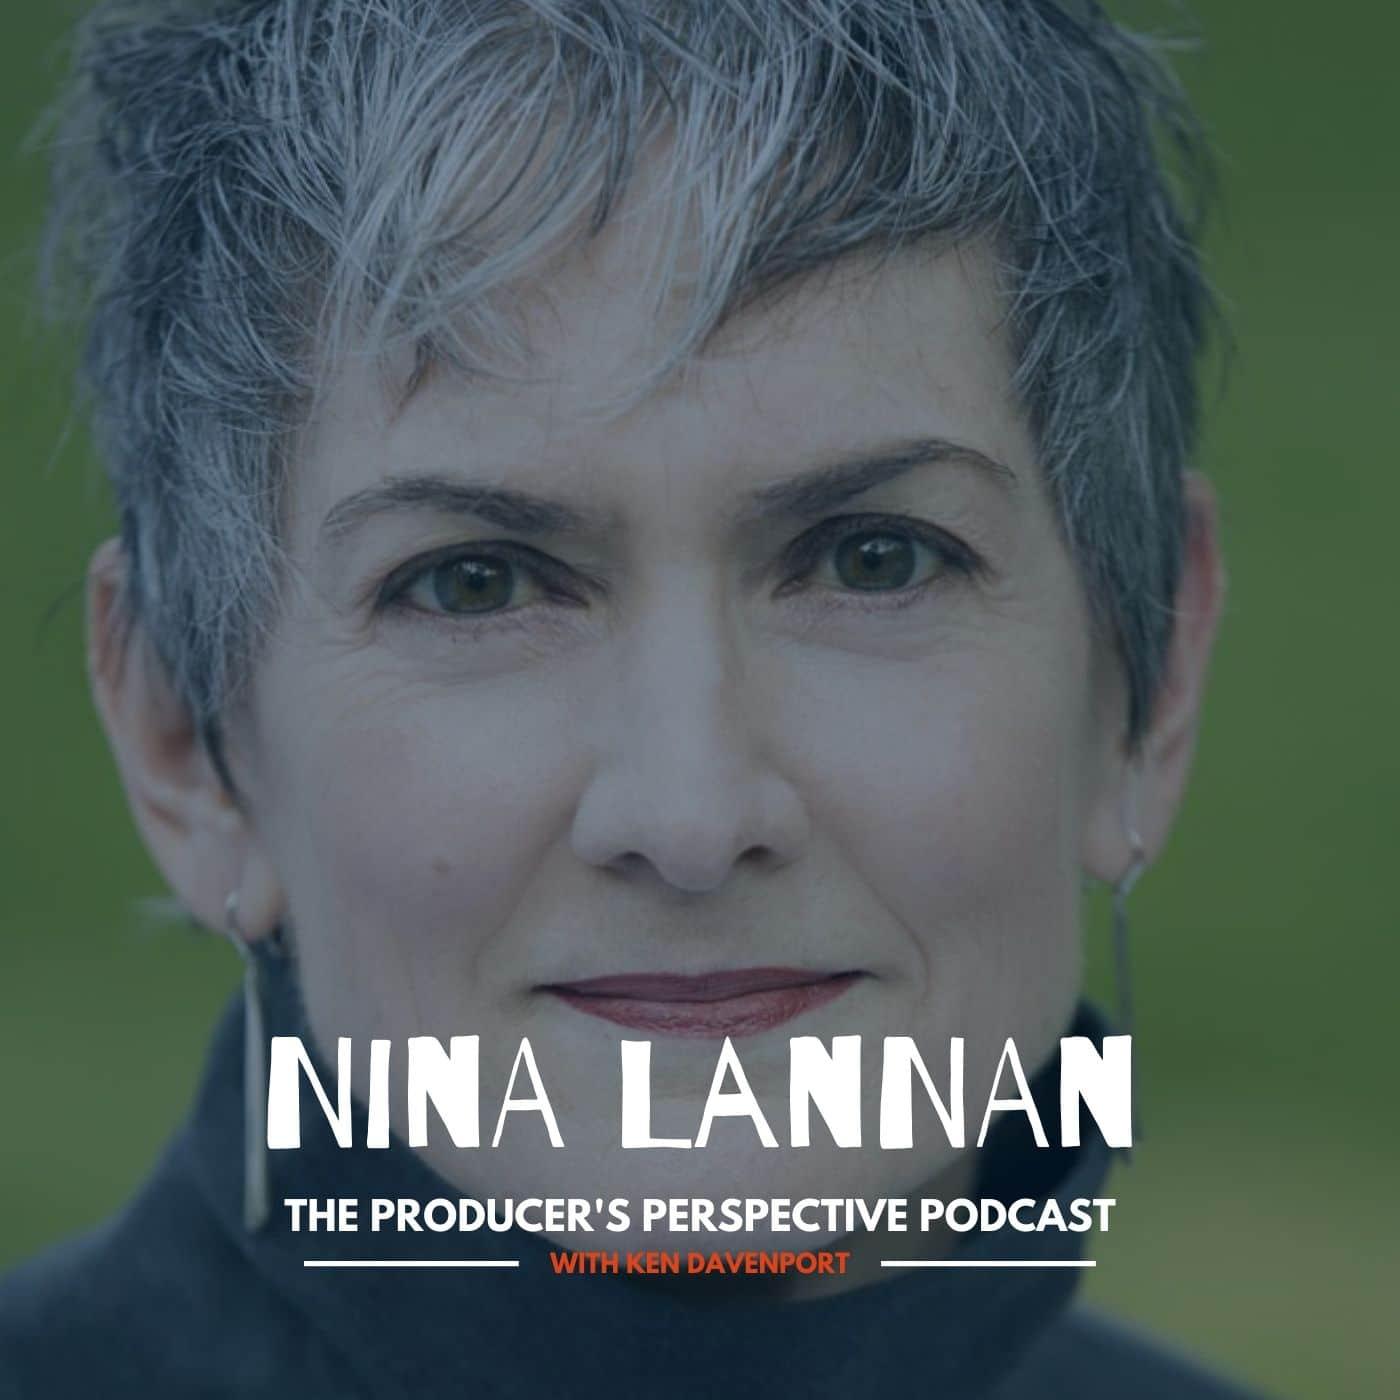 Ken Davenport's The Producer's Perspective Podcast Episode 3 - Nina Lannan